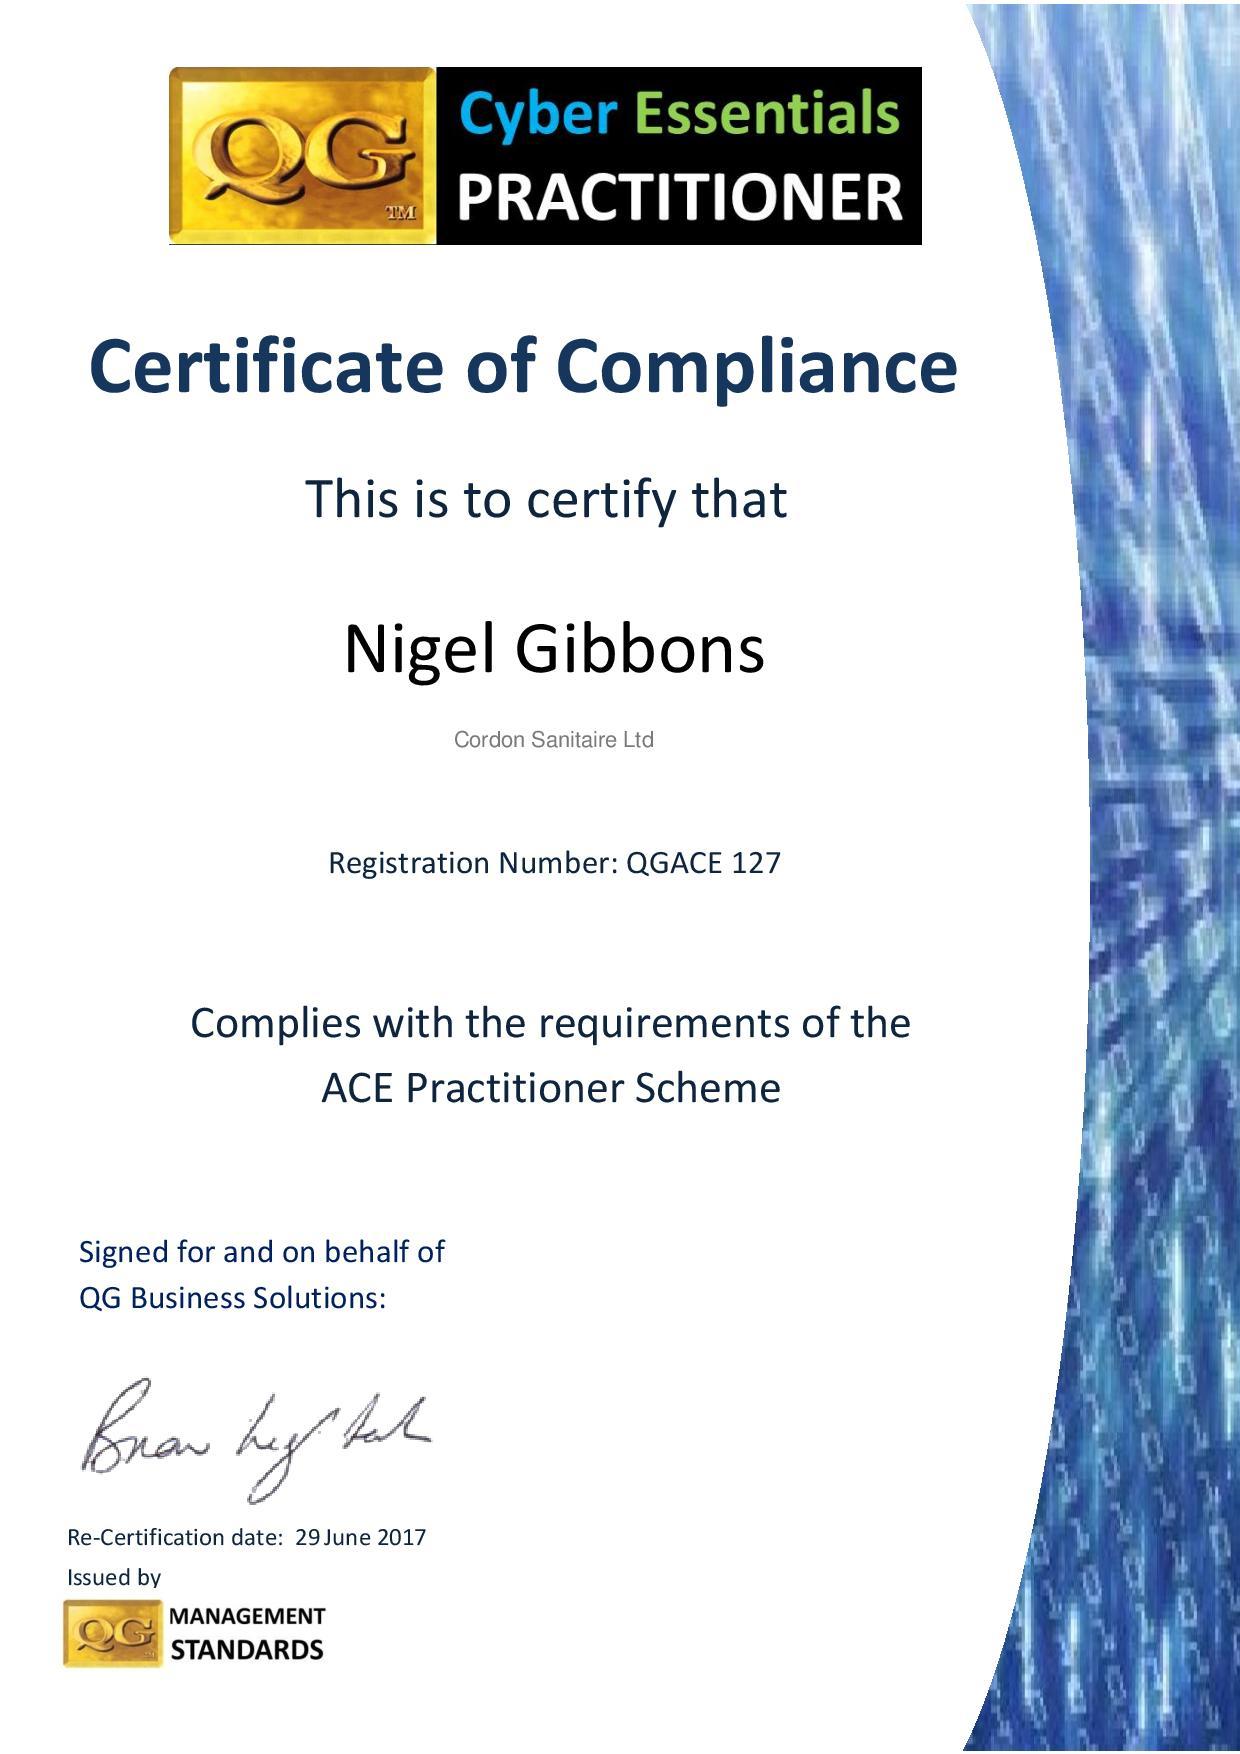 QGACE127 Nigel